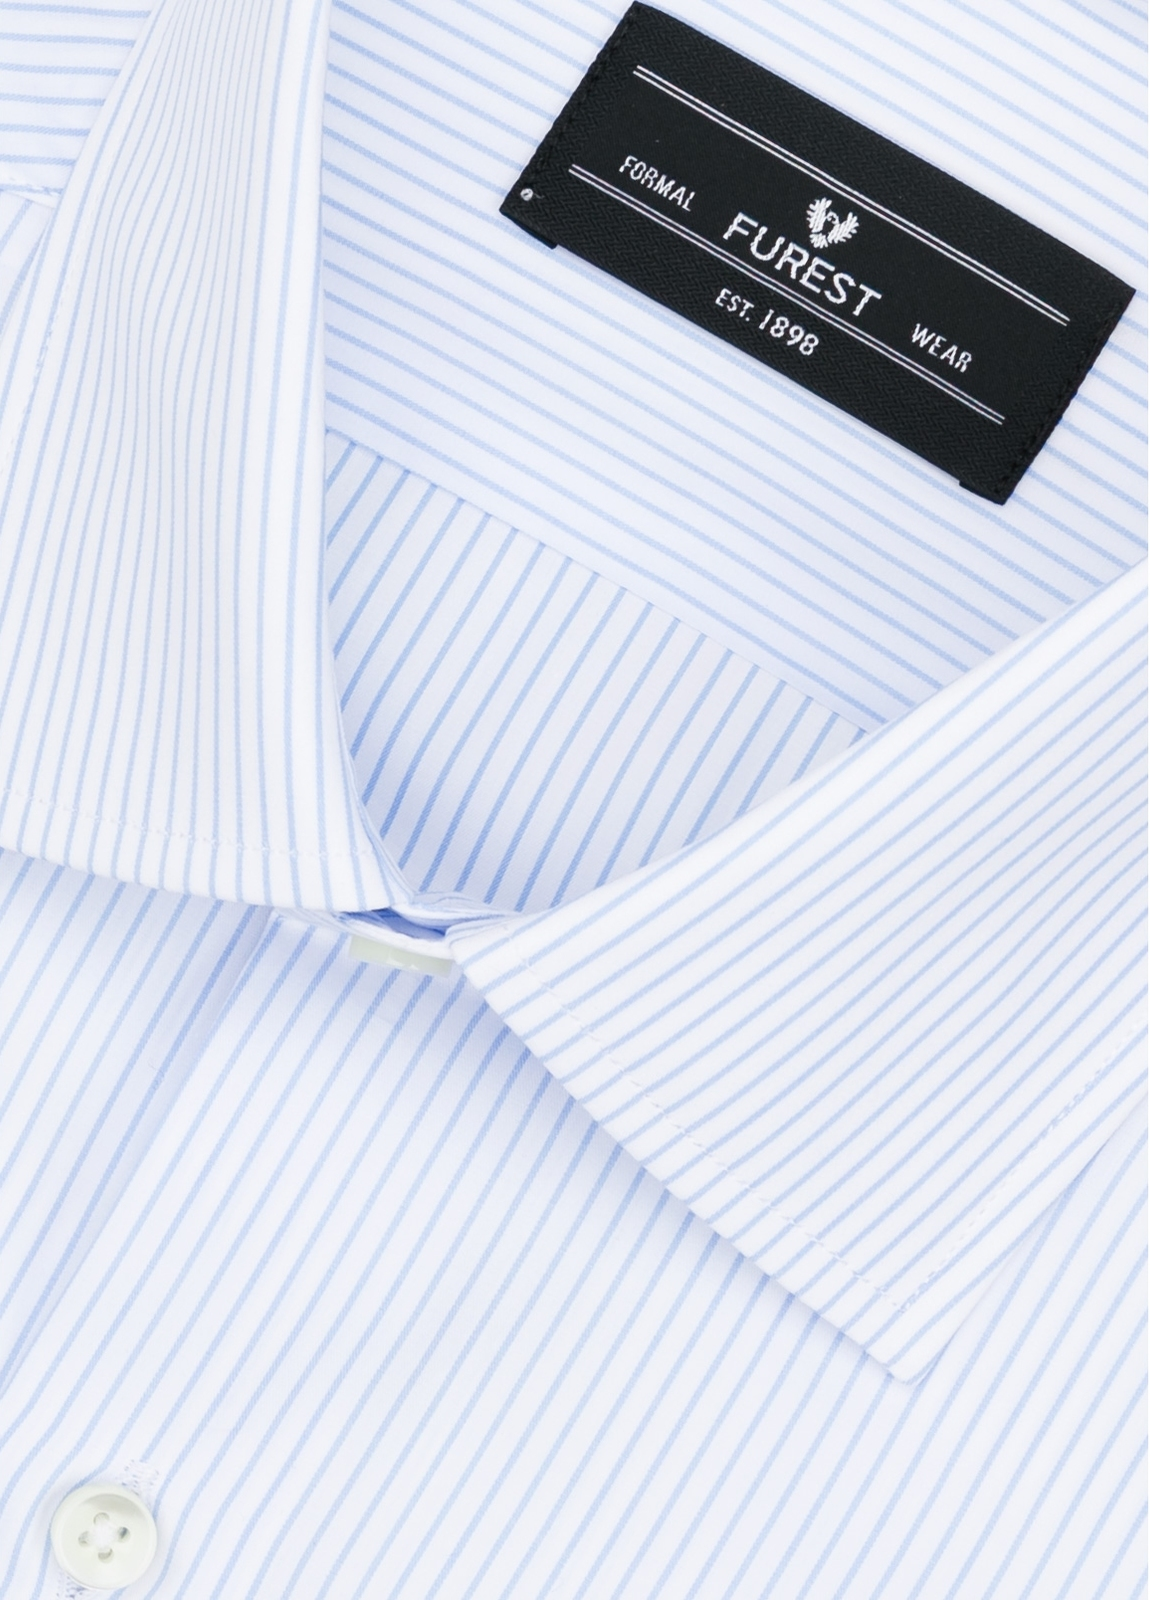 Camisa Formal Wear SLIM FIT cuello italiano modelo ROMA microraya color celeste. 100% Algodón. - Ítem1